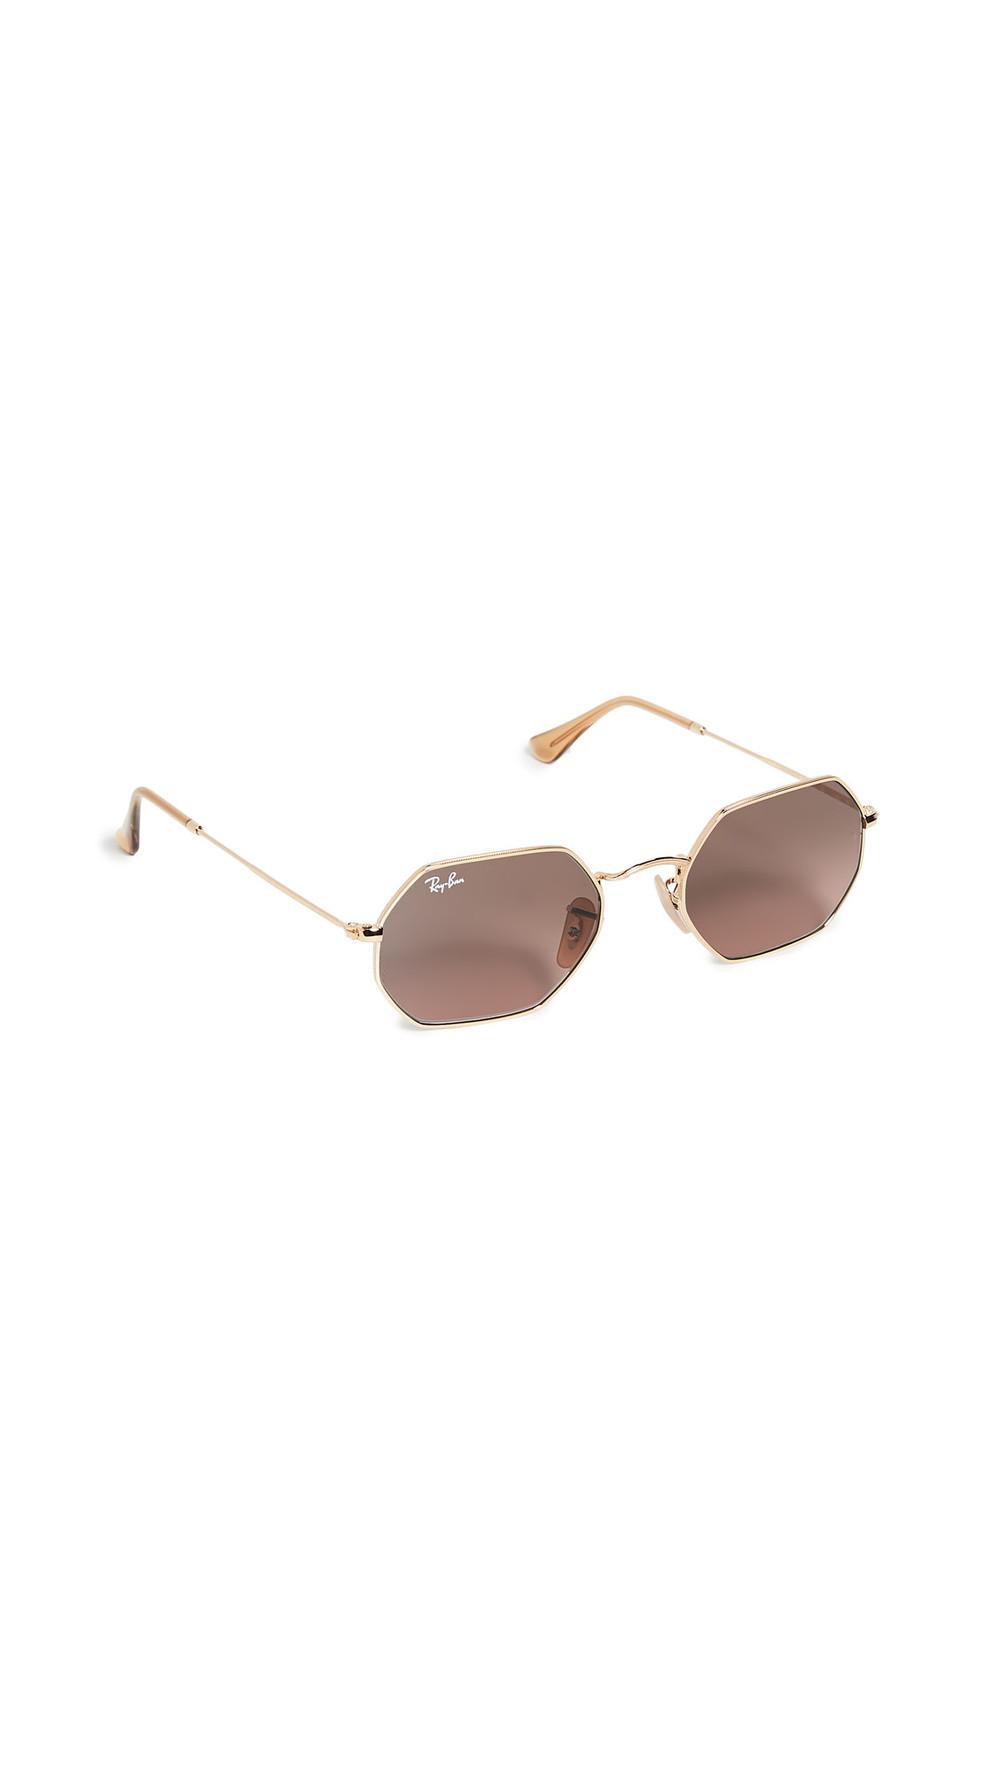 Ray-Ban Narrow Icons Hexagonal Sunglasses in brown / gold / grey